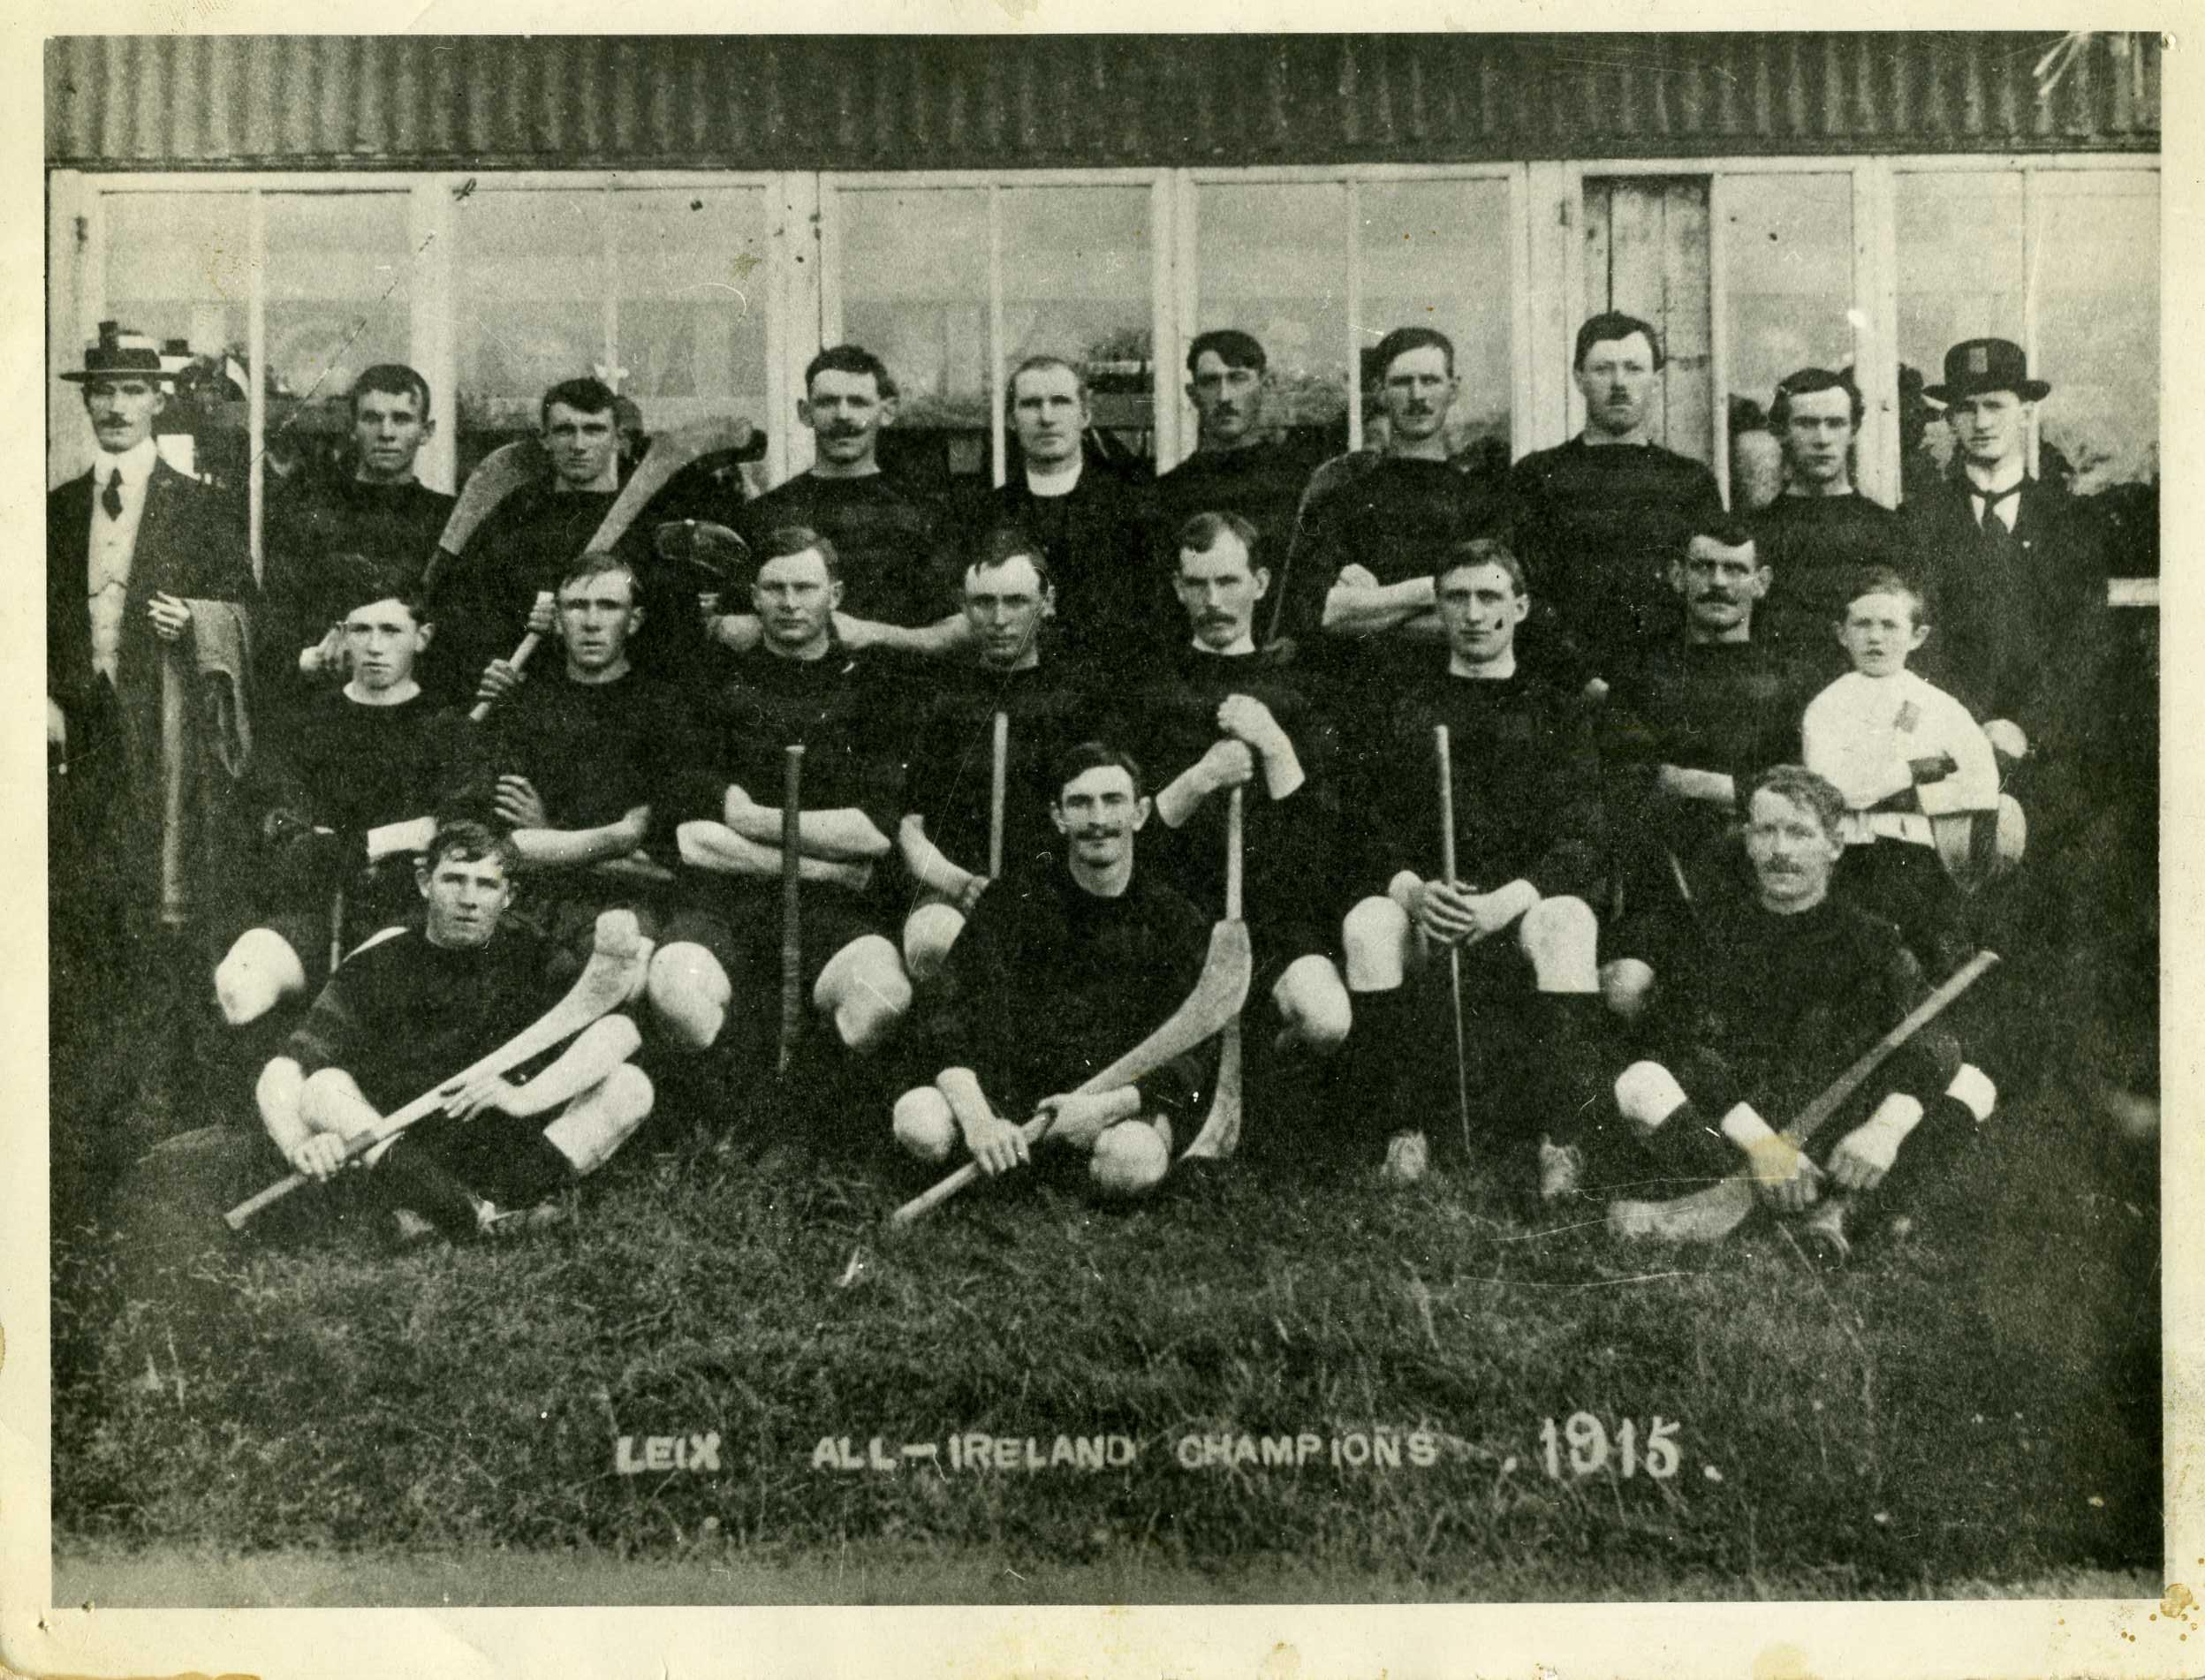 Laois (Ballygeehan) 1915 Hurling All-Ireland Champions